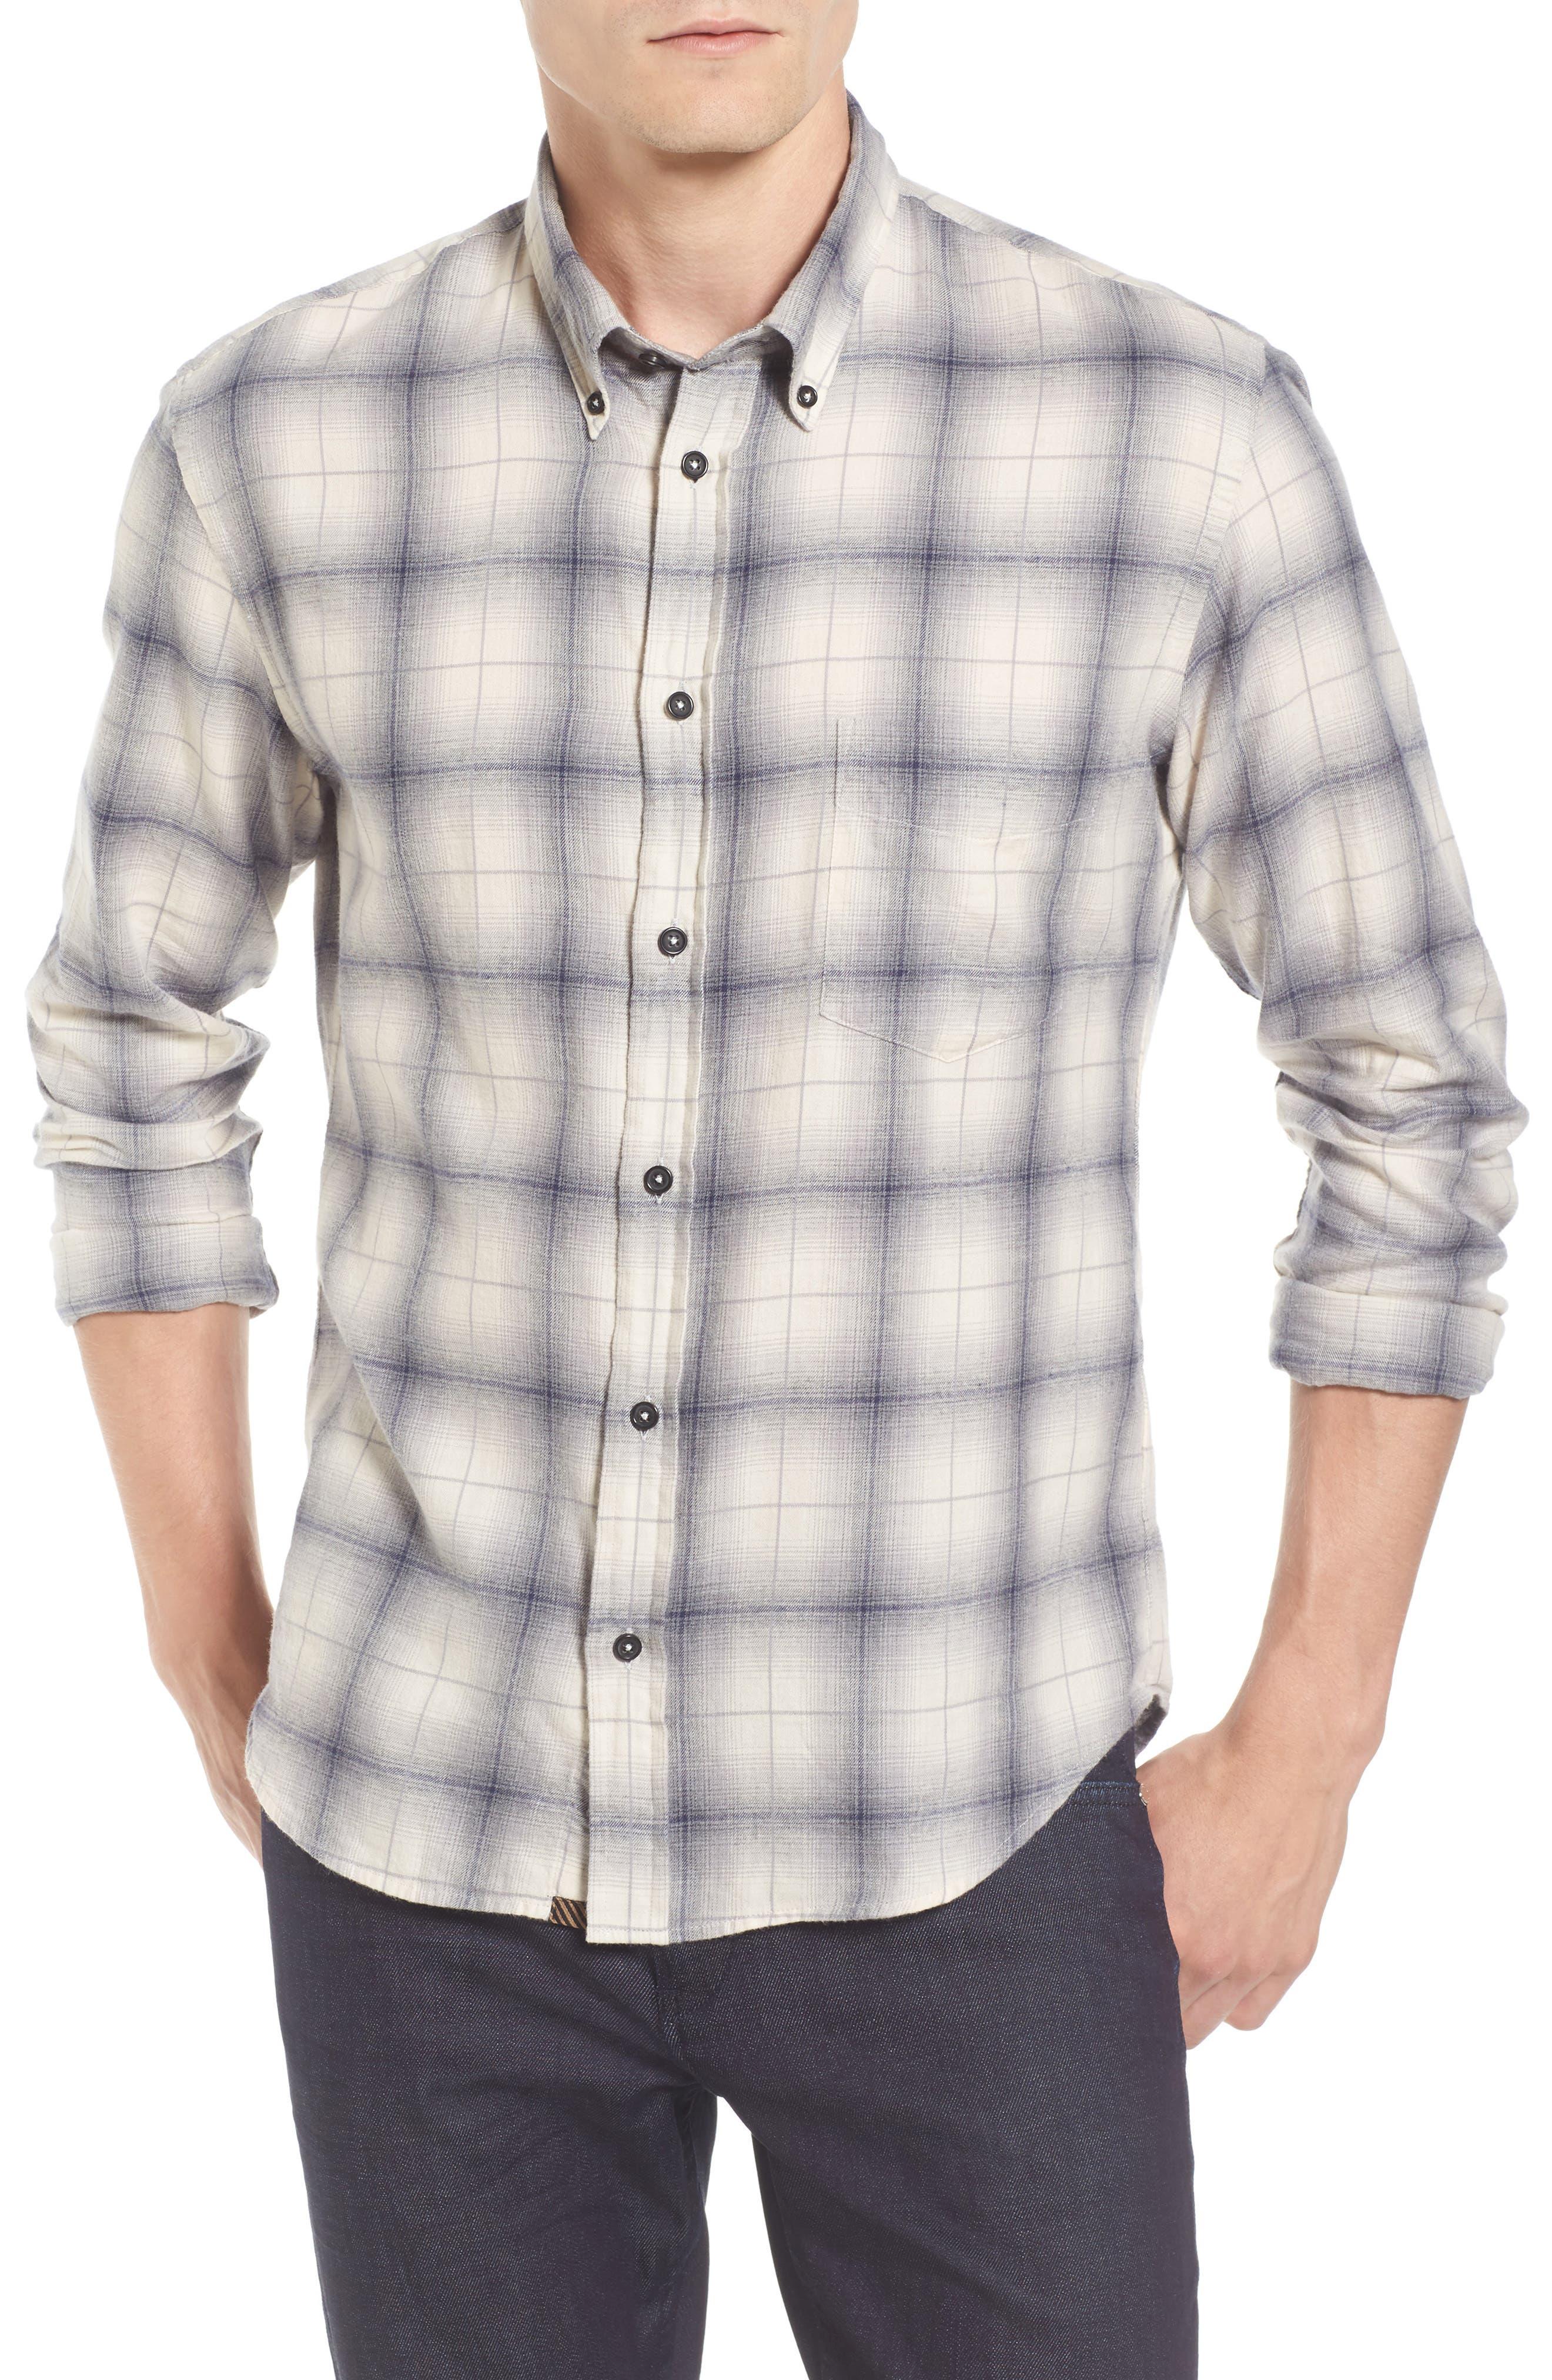 Main Image - Billy Reid Kirby Slim Fit Plaid Flannel Shirt